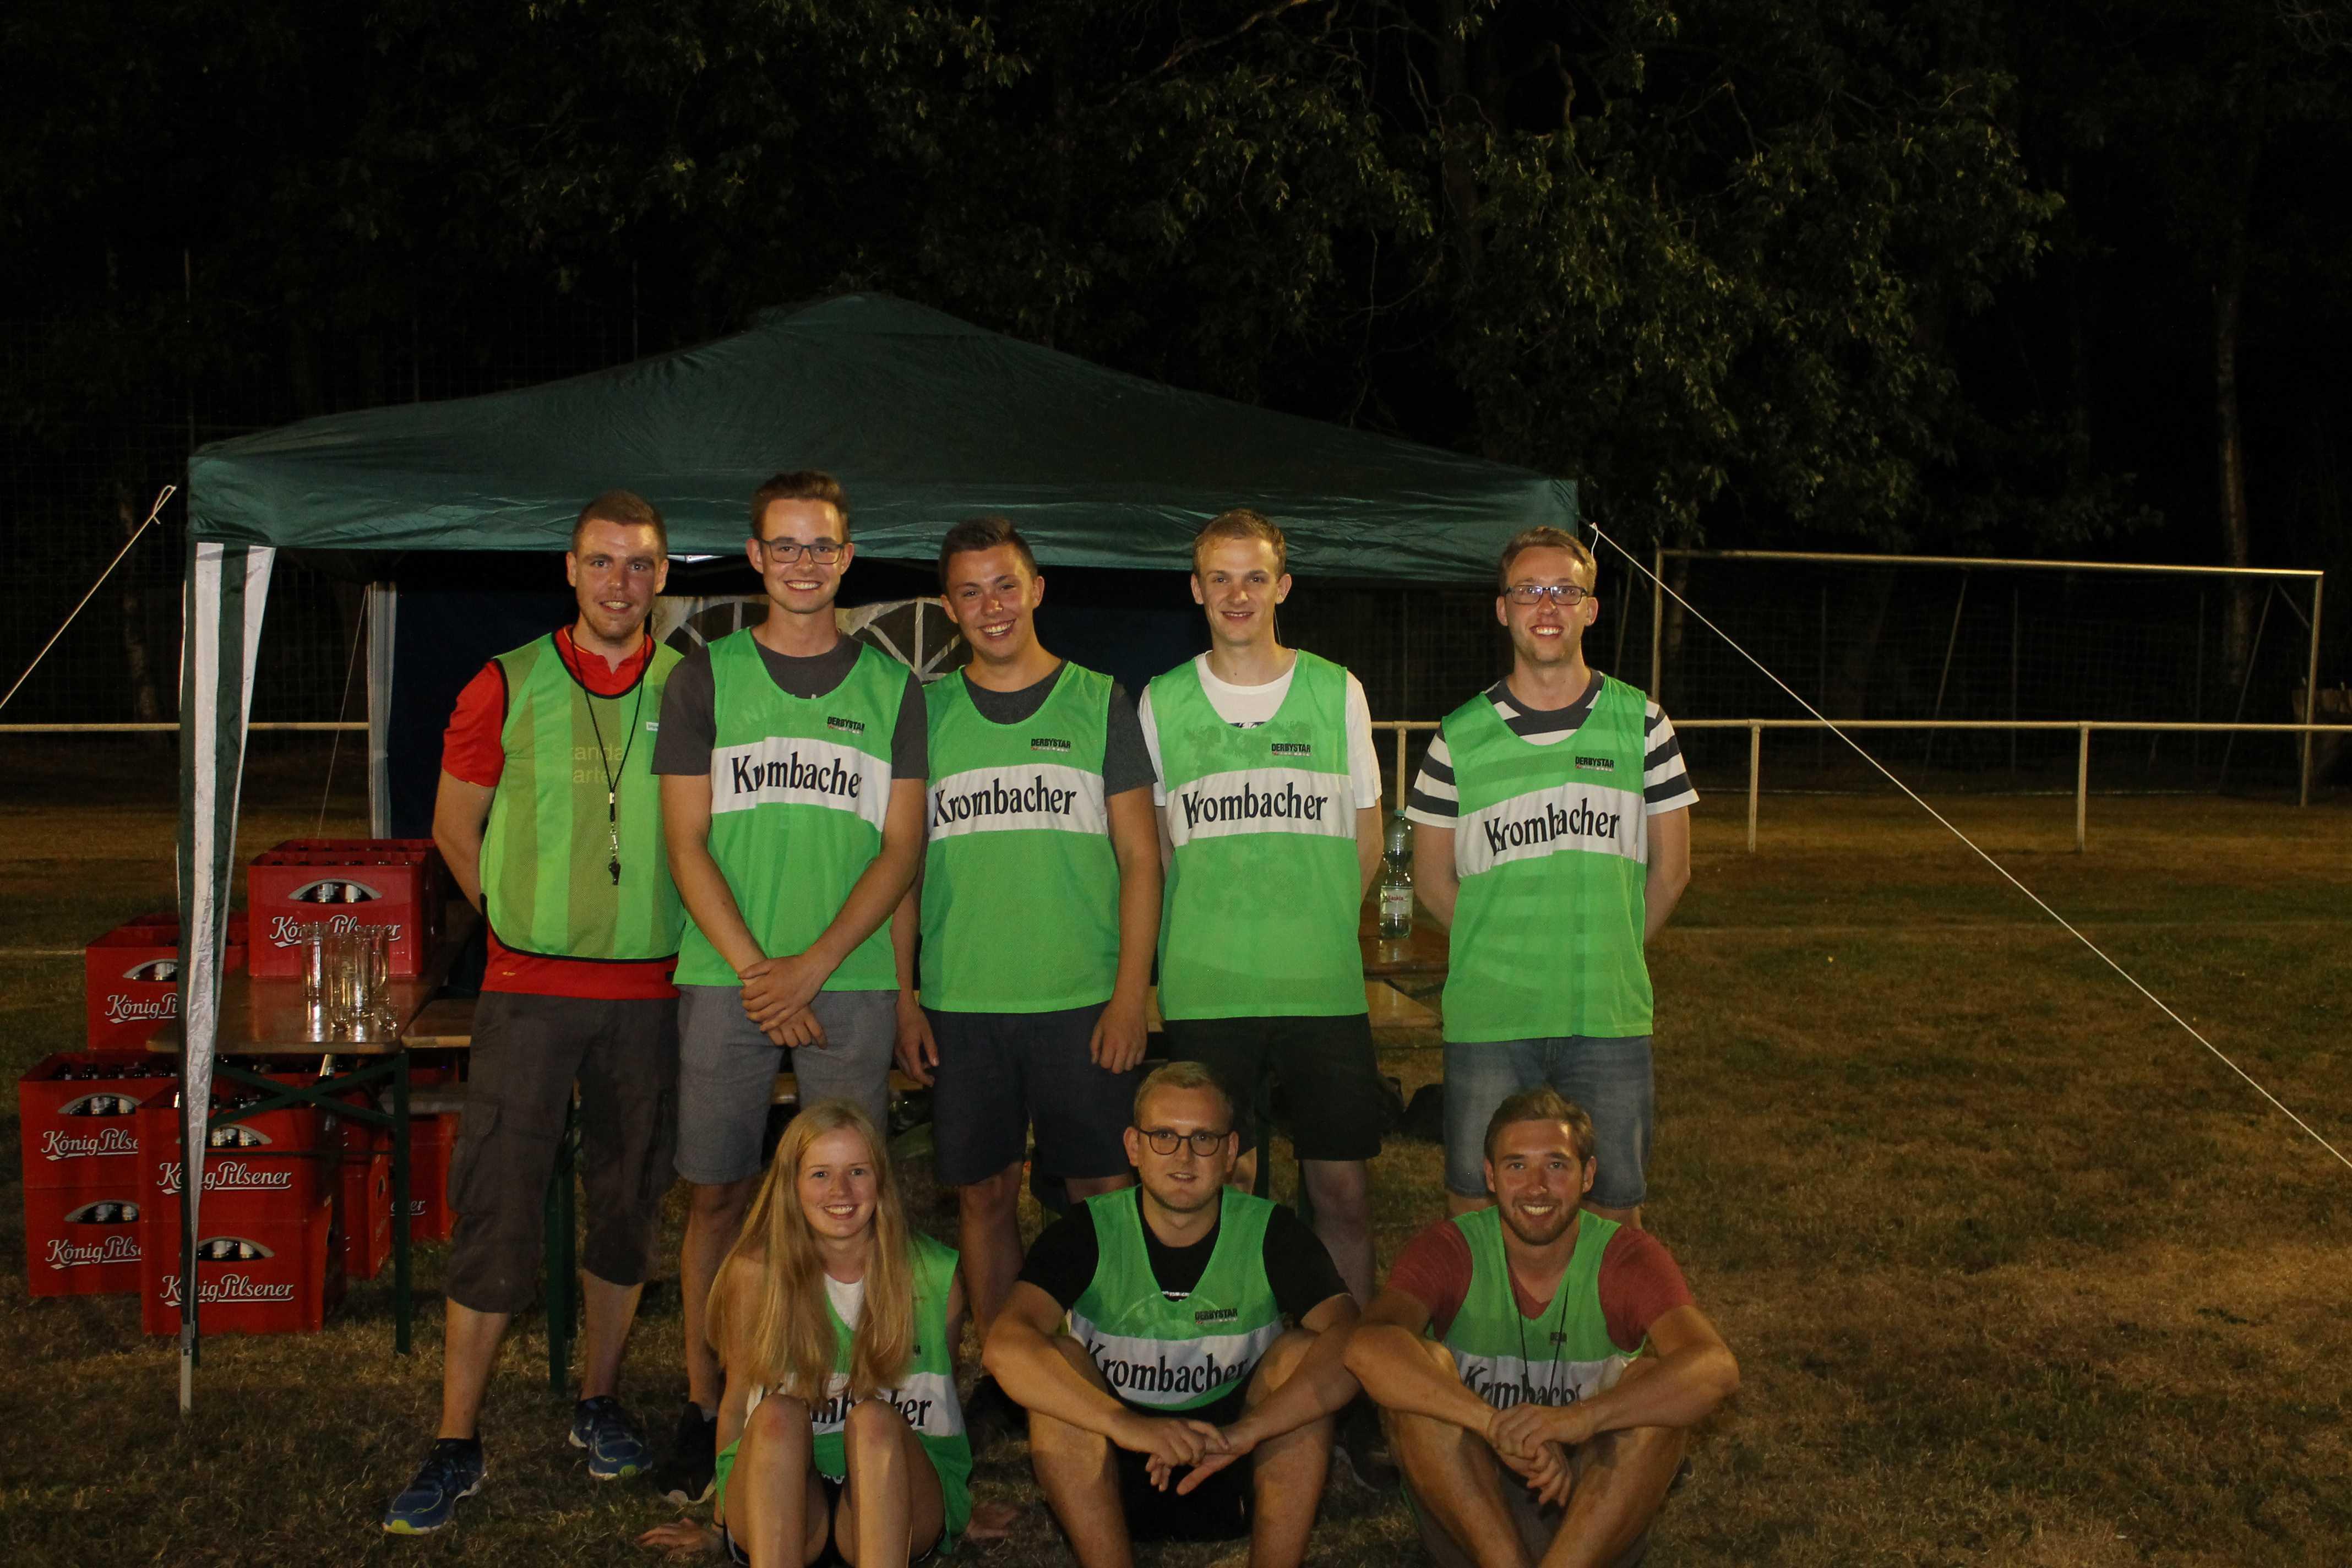 2018-07-27 Sportwoche - Flunkyball Turnier (98)